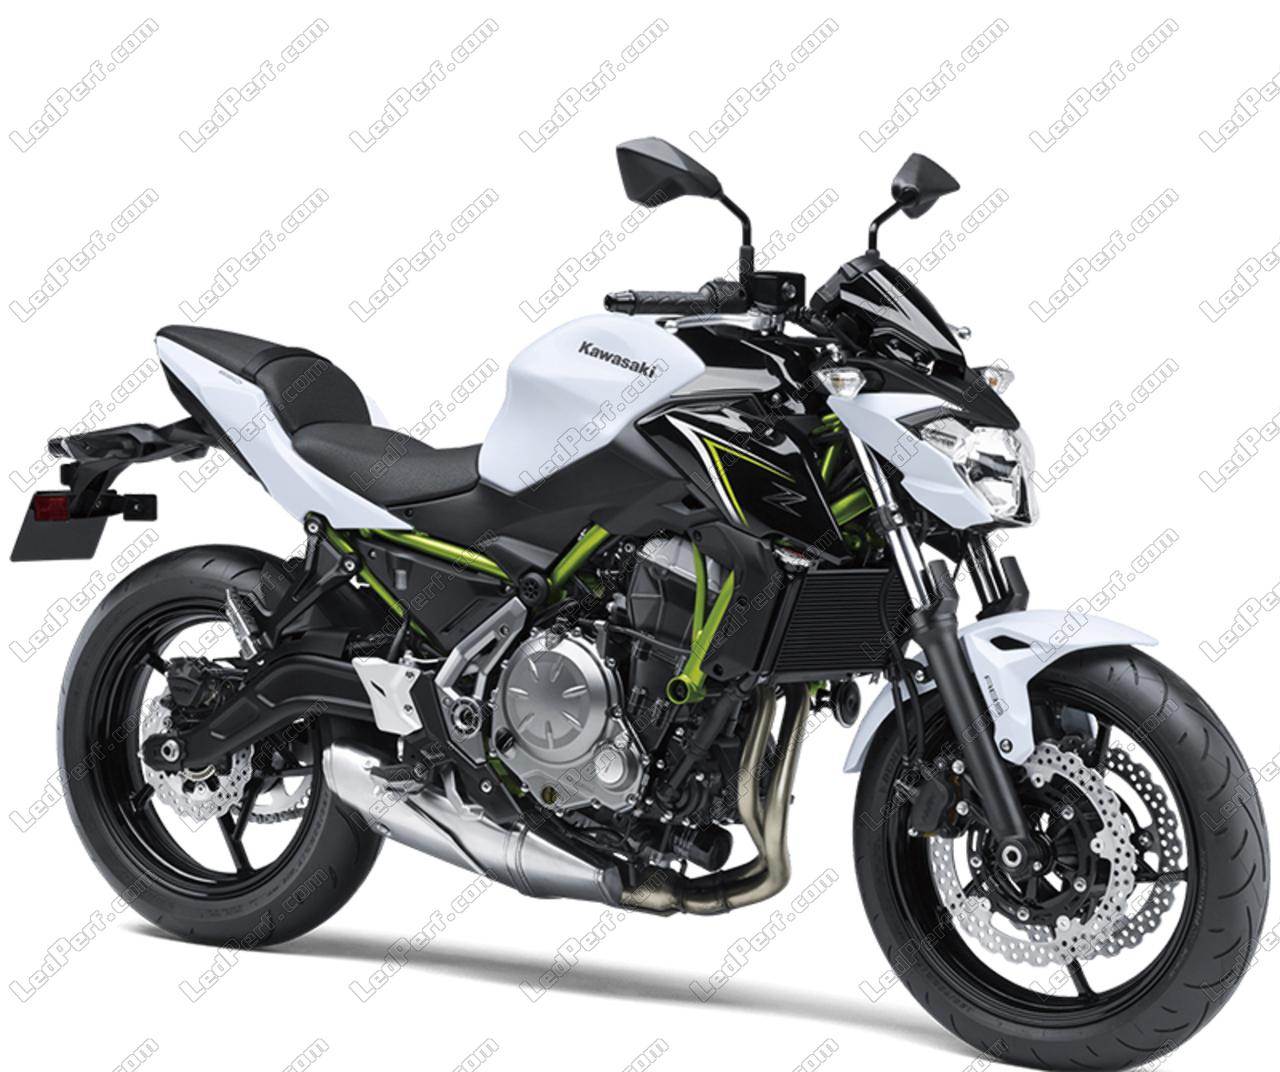 Kawasaki Z650: Pack LED Sidelights For Kawasaki Z650 (side Lights